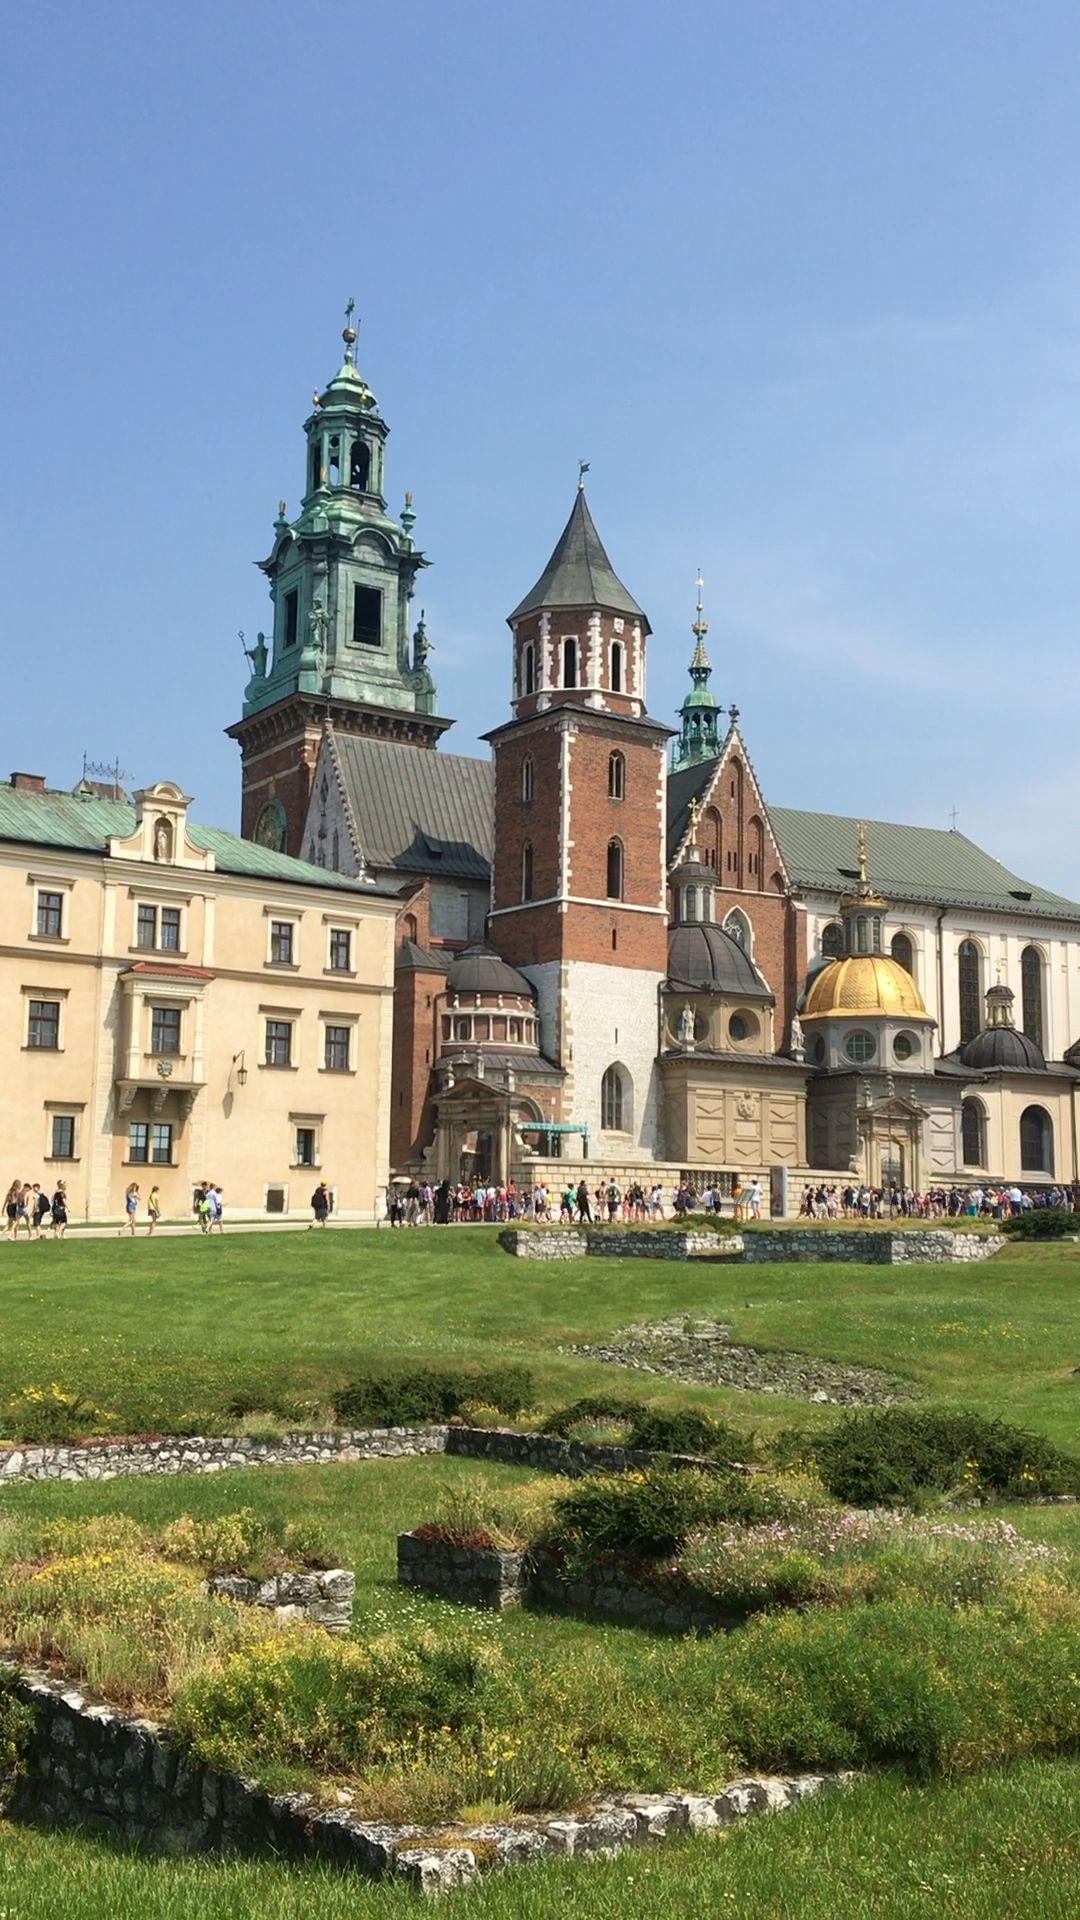 Wawel Royal Castle in Krakow, Poland - visit our guide for Krakow travel tips!